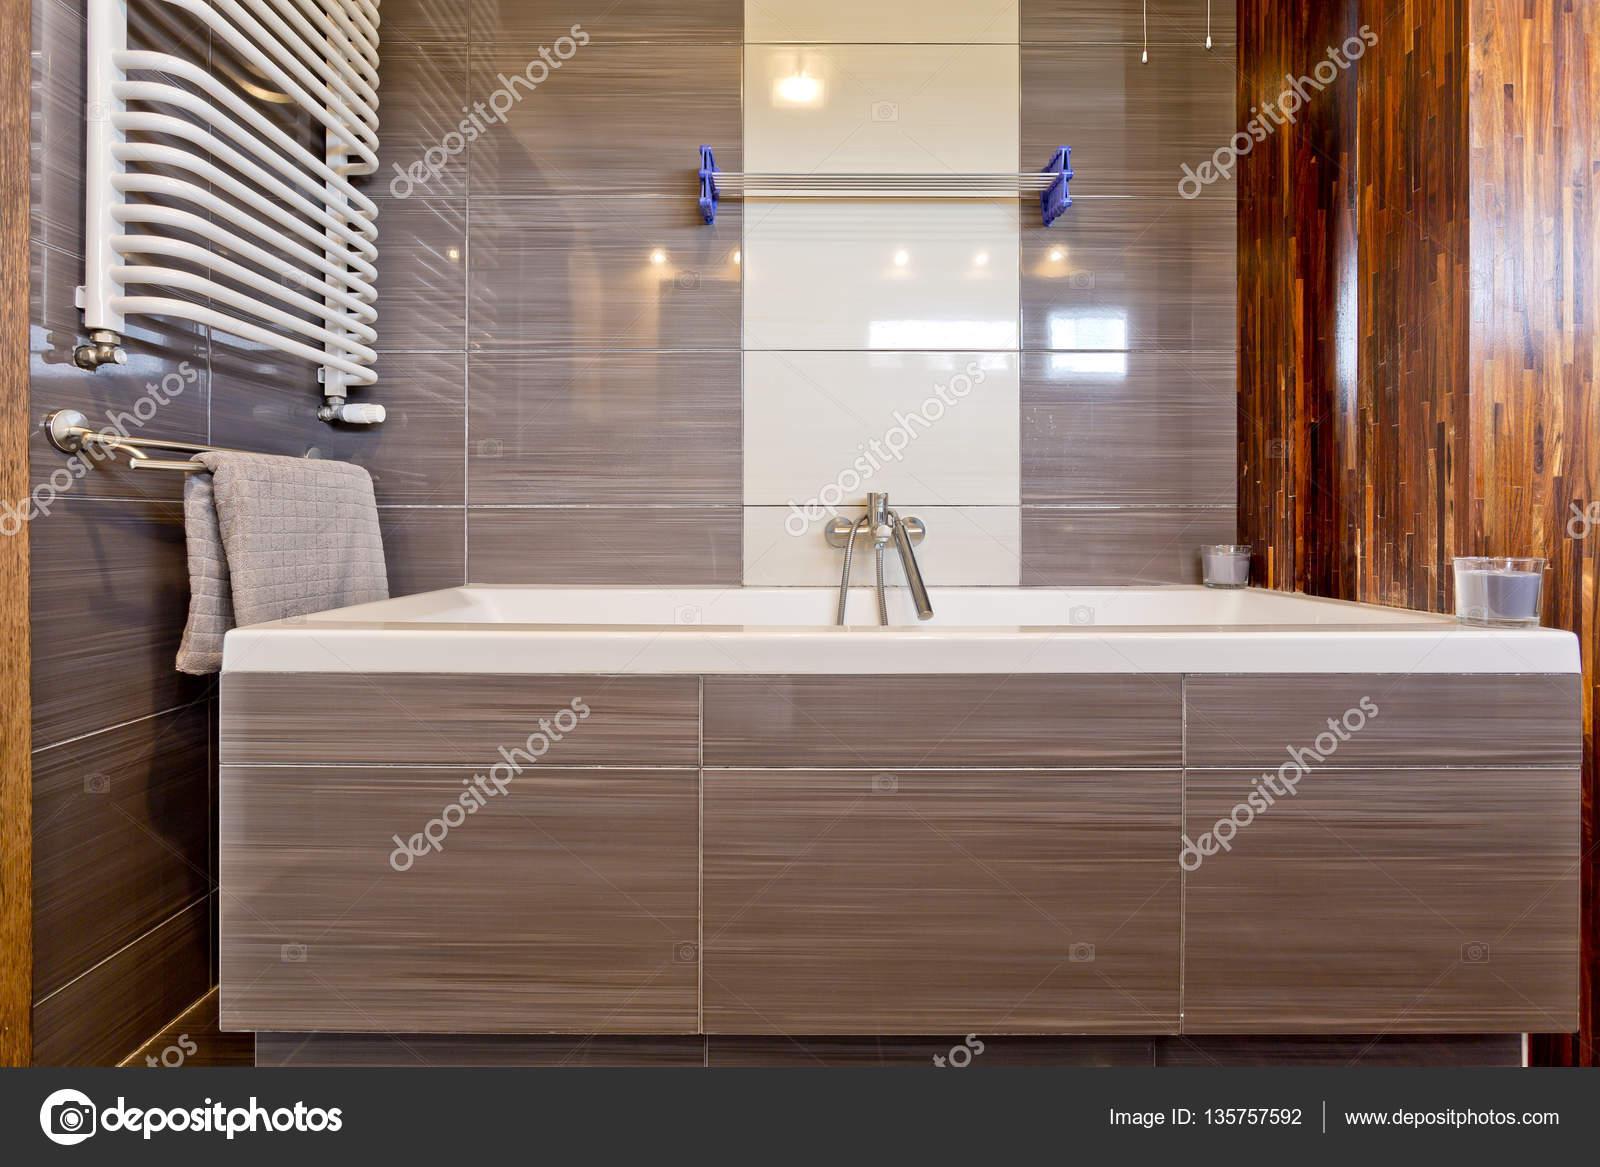 Bad Und Heizkorper Im Badezimmer Stockfoto C Photographee Eu